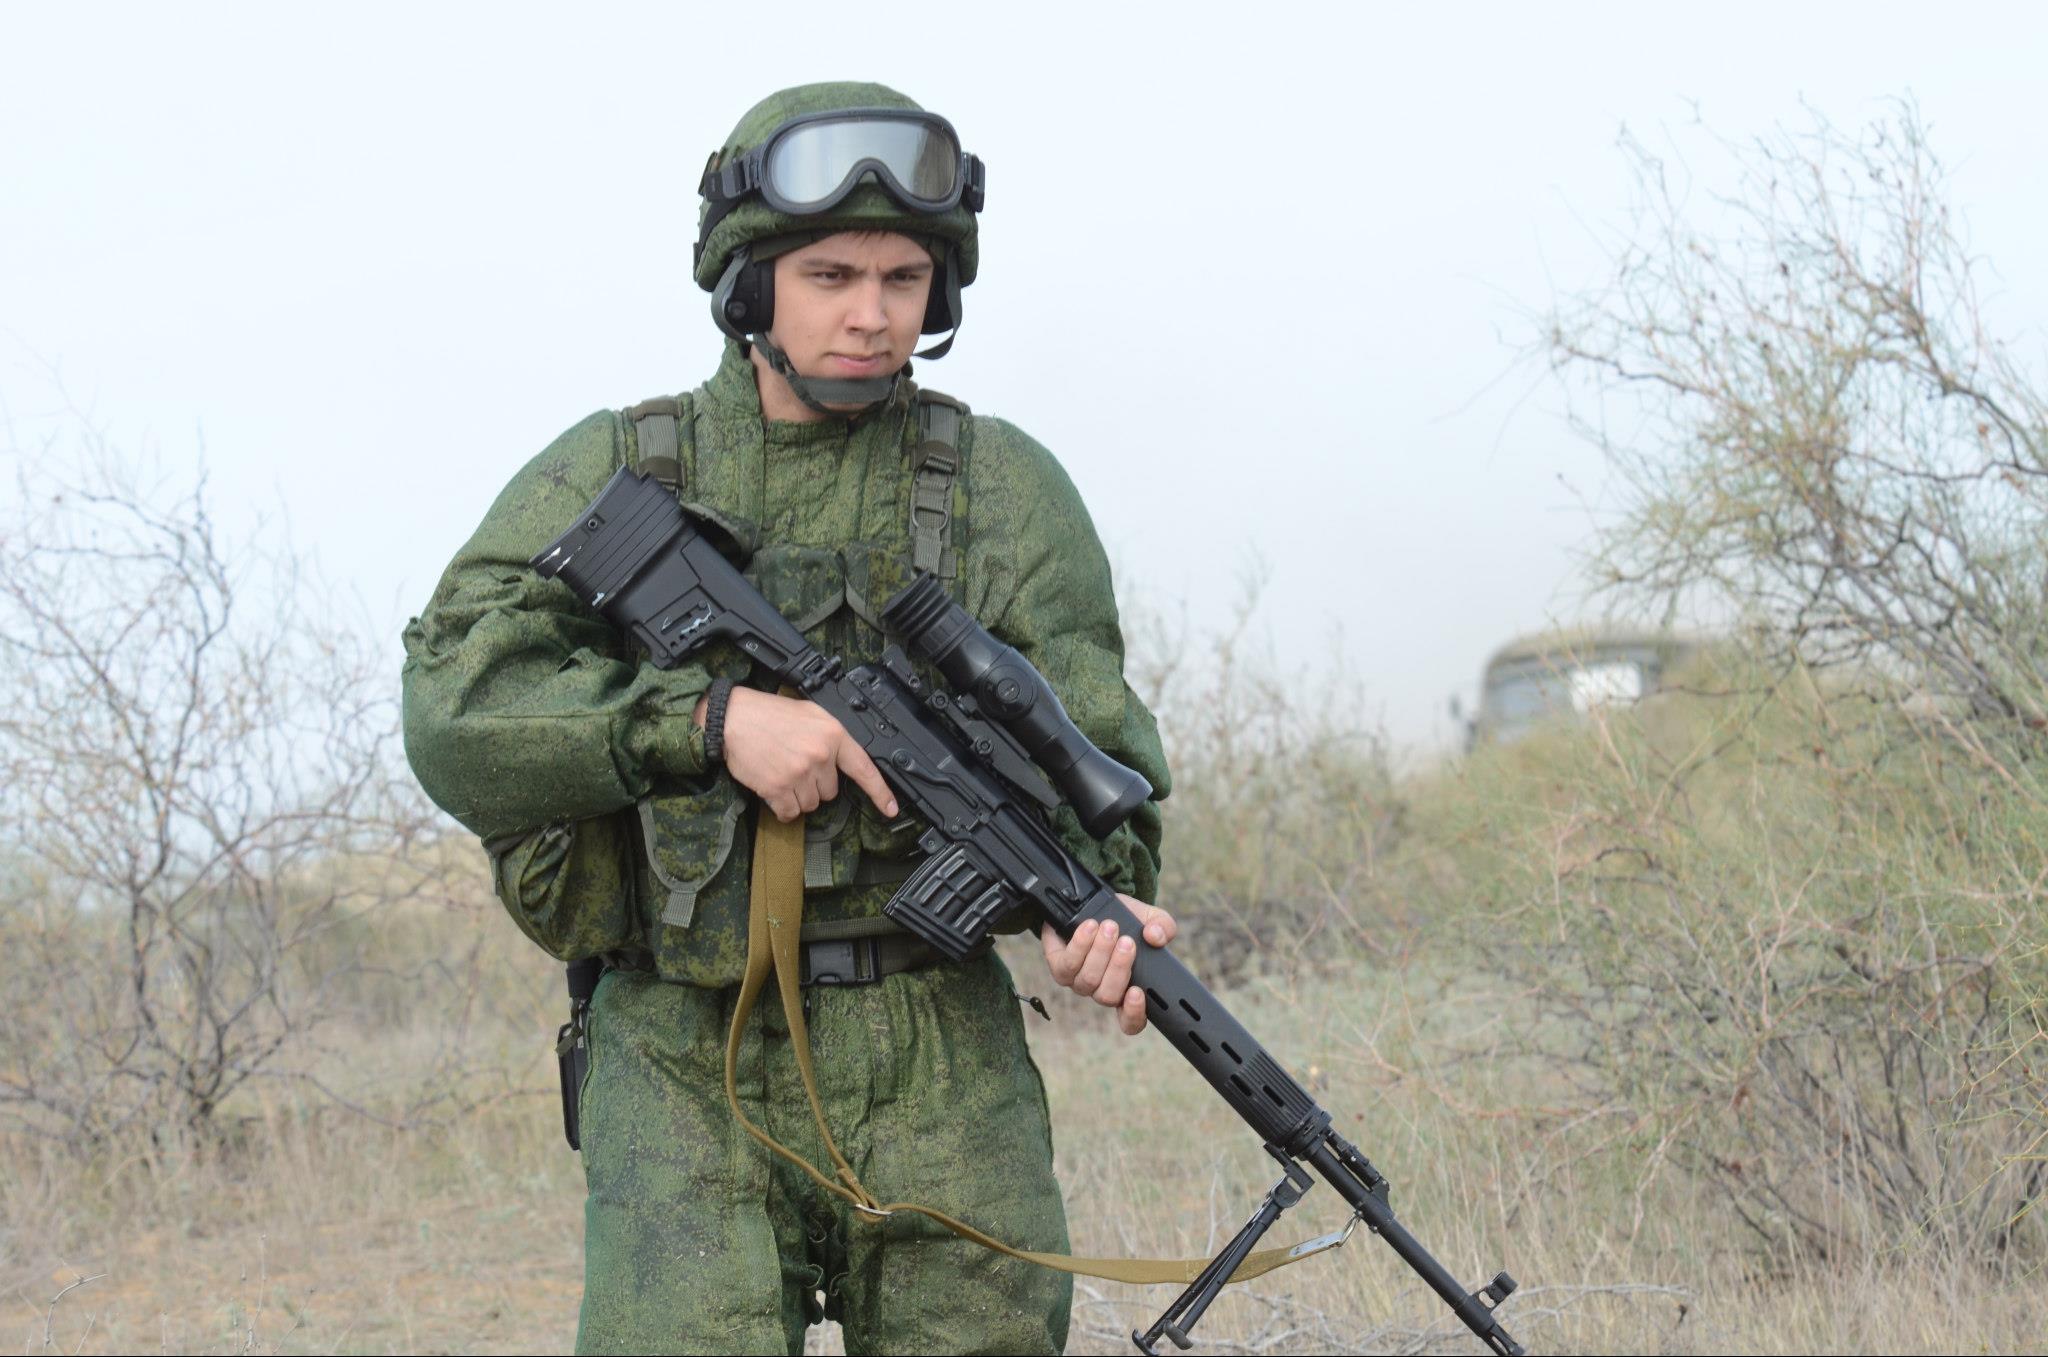 Russian Army Equipment Trials Sorta Image Heavy